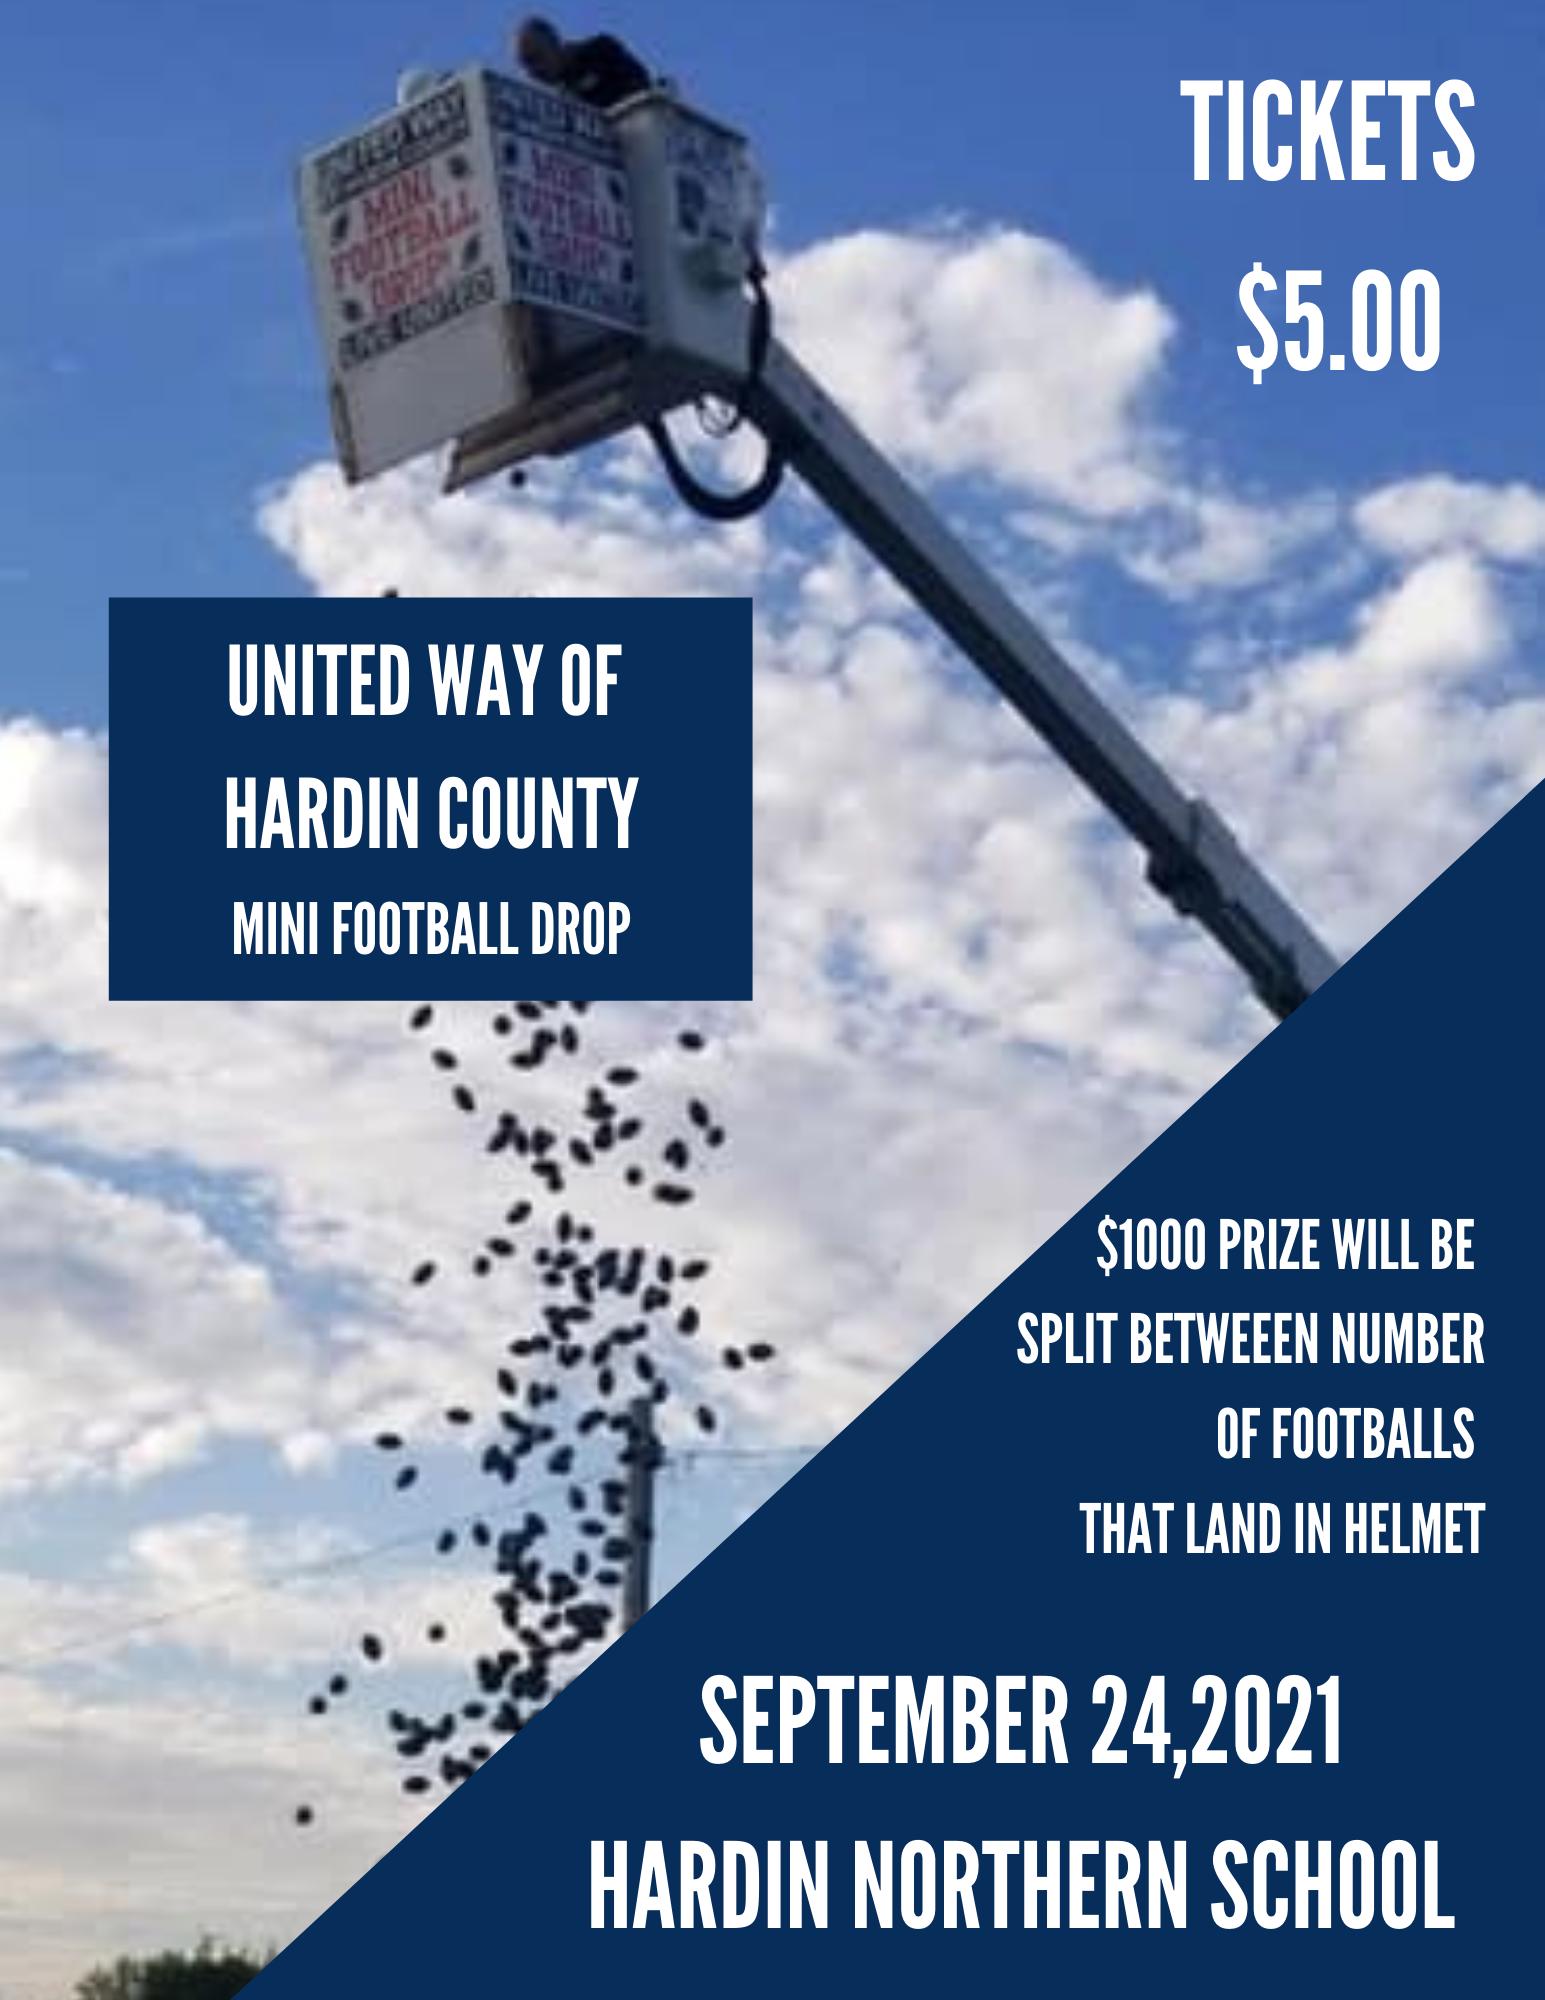 United Way of Hardin County Mini Football Drop